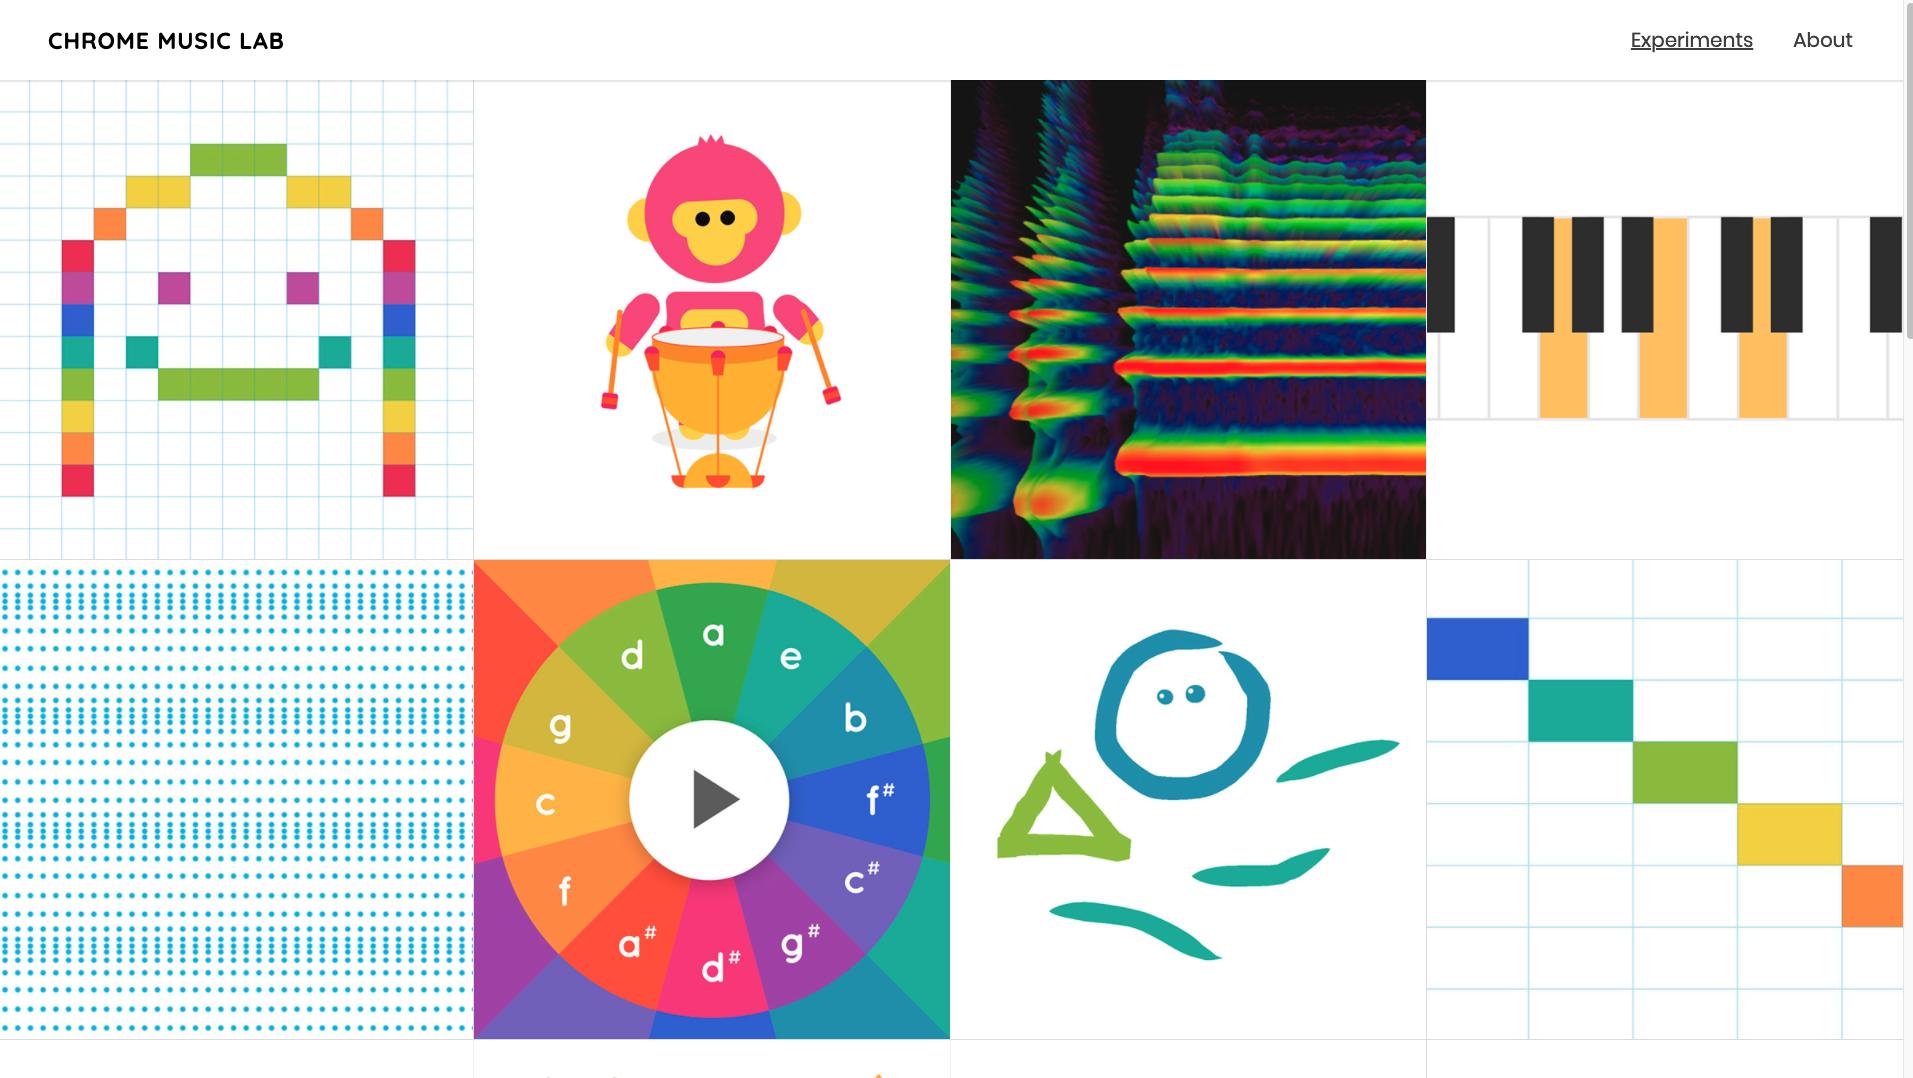 Homepage of Chrome Music Lab